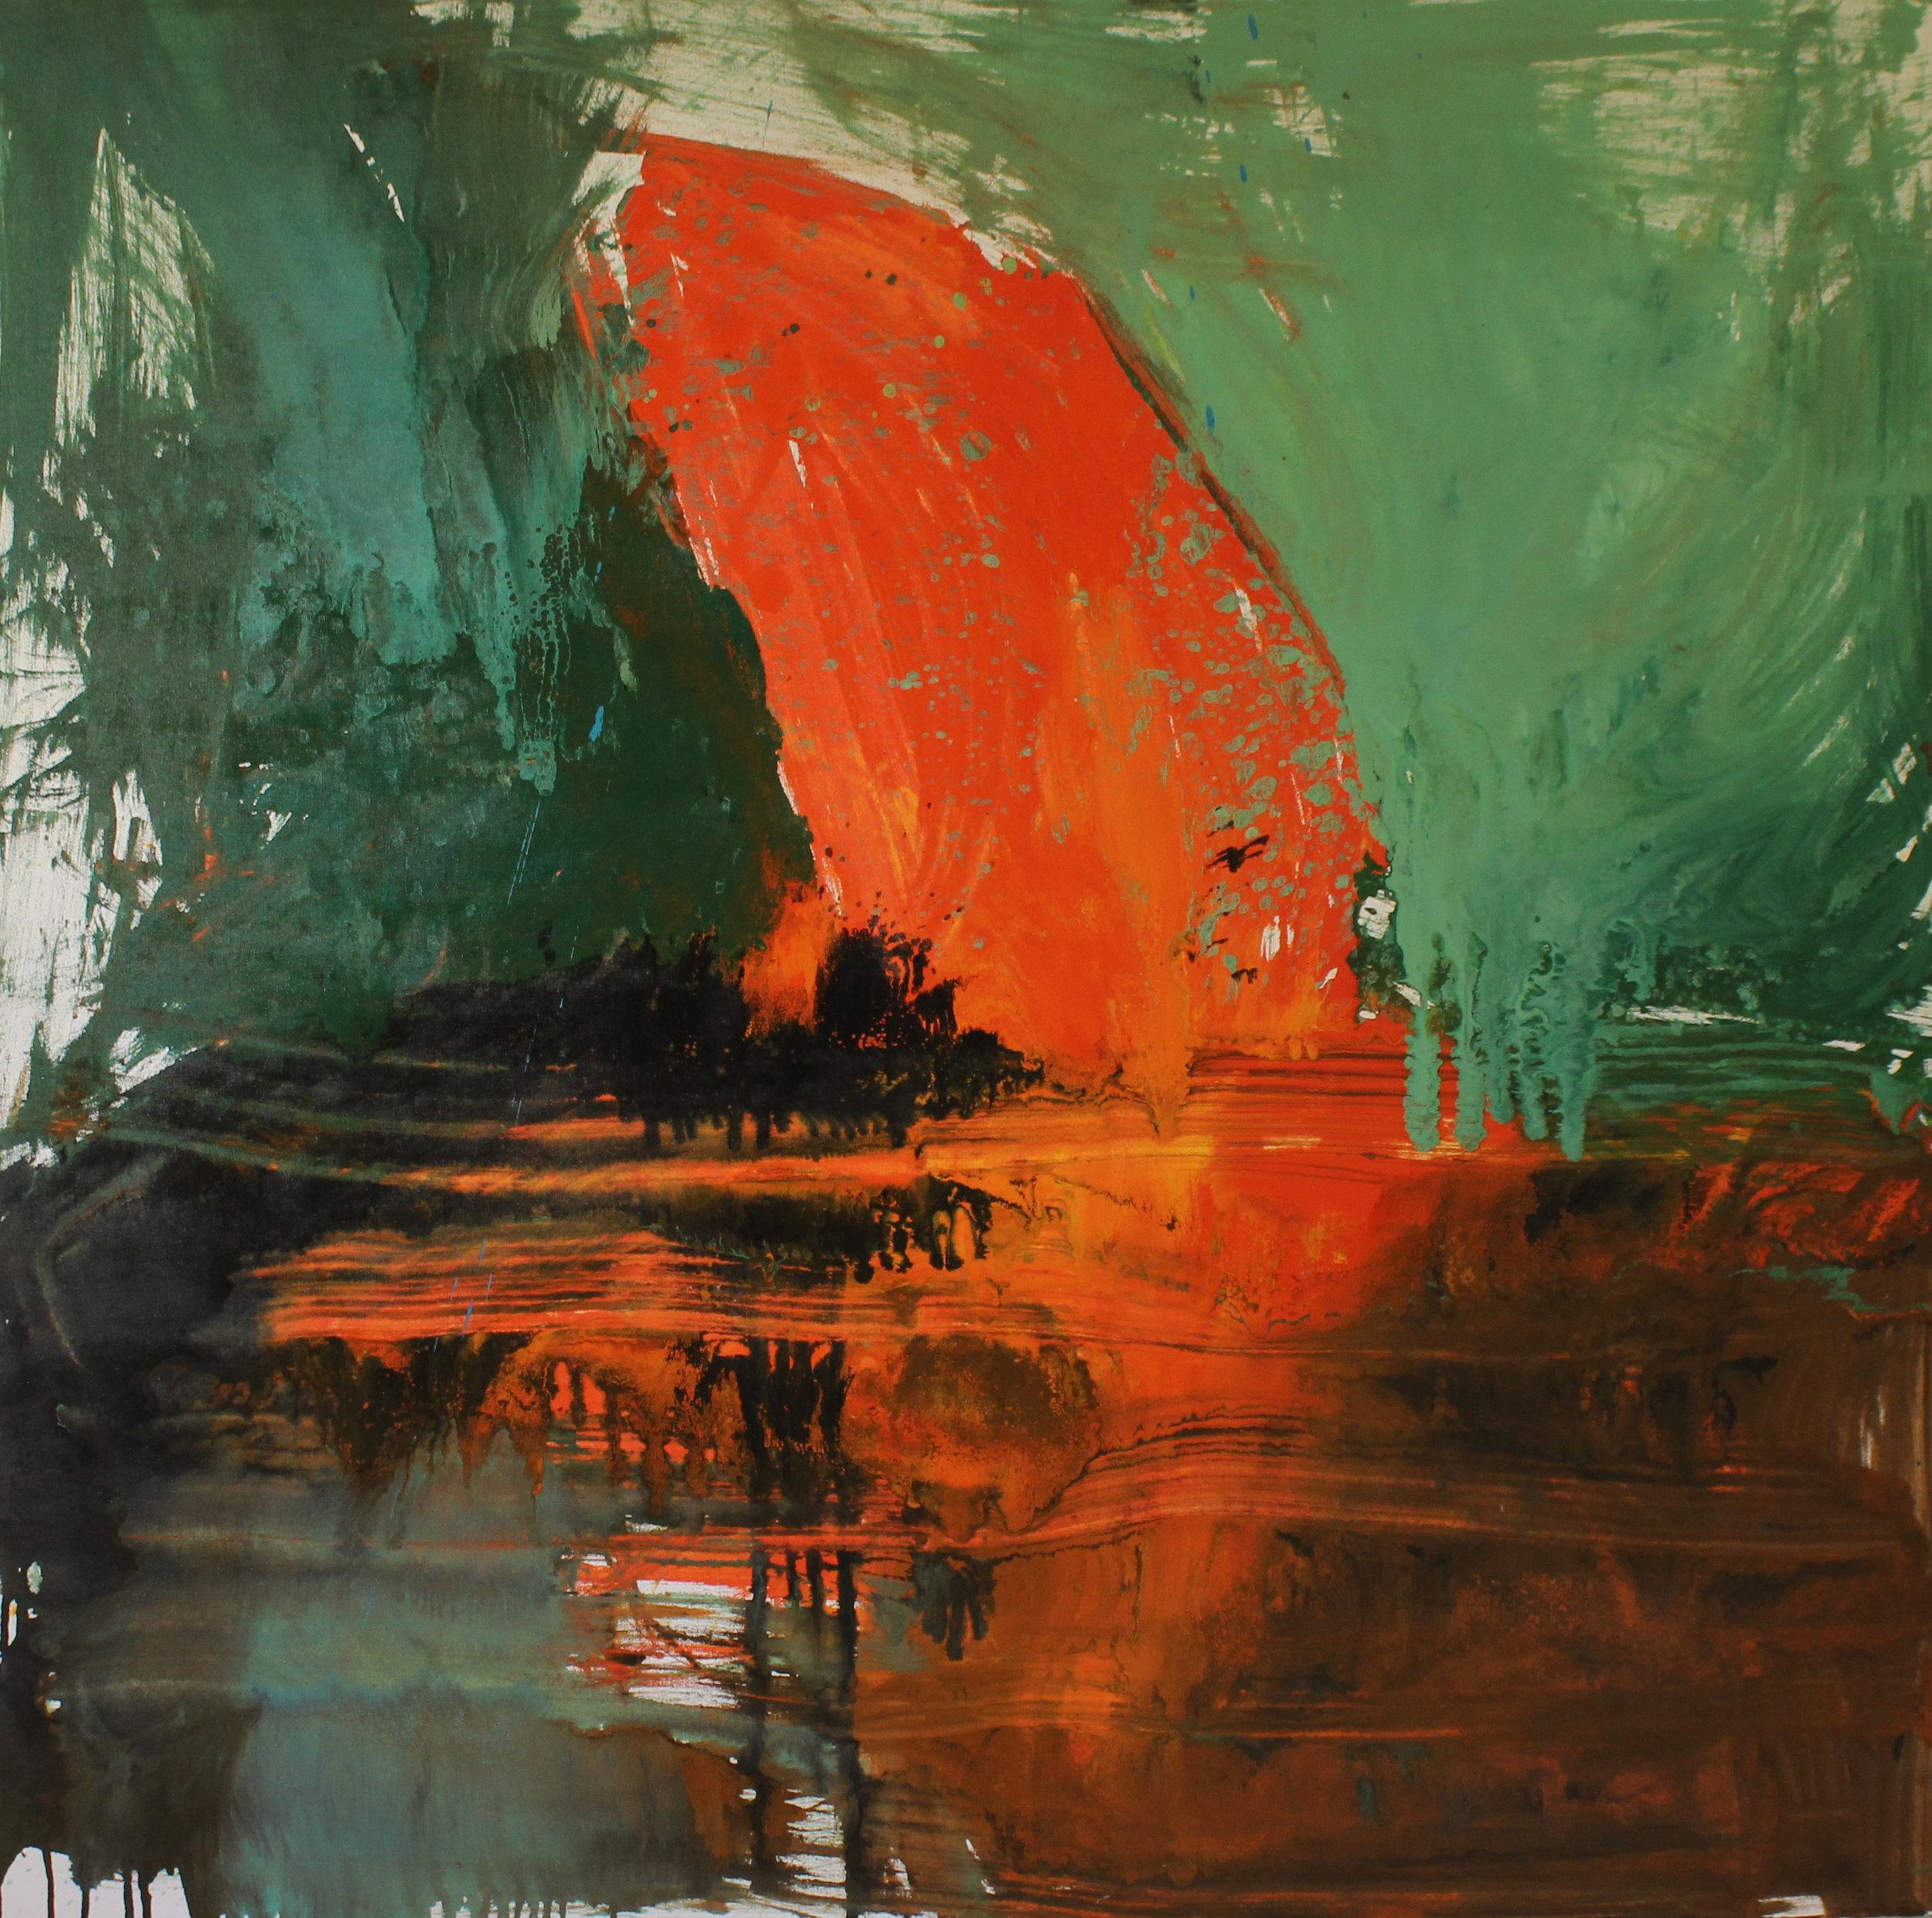 Untitled, 2014, enamel paint on canvas, 152 x 152 cm